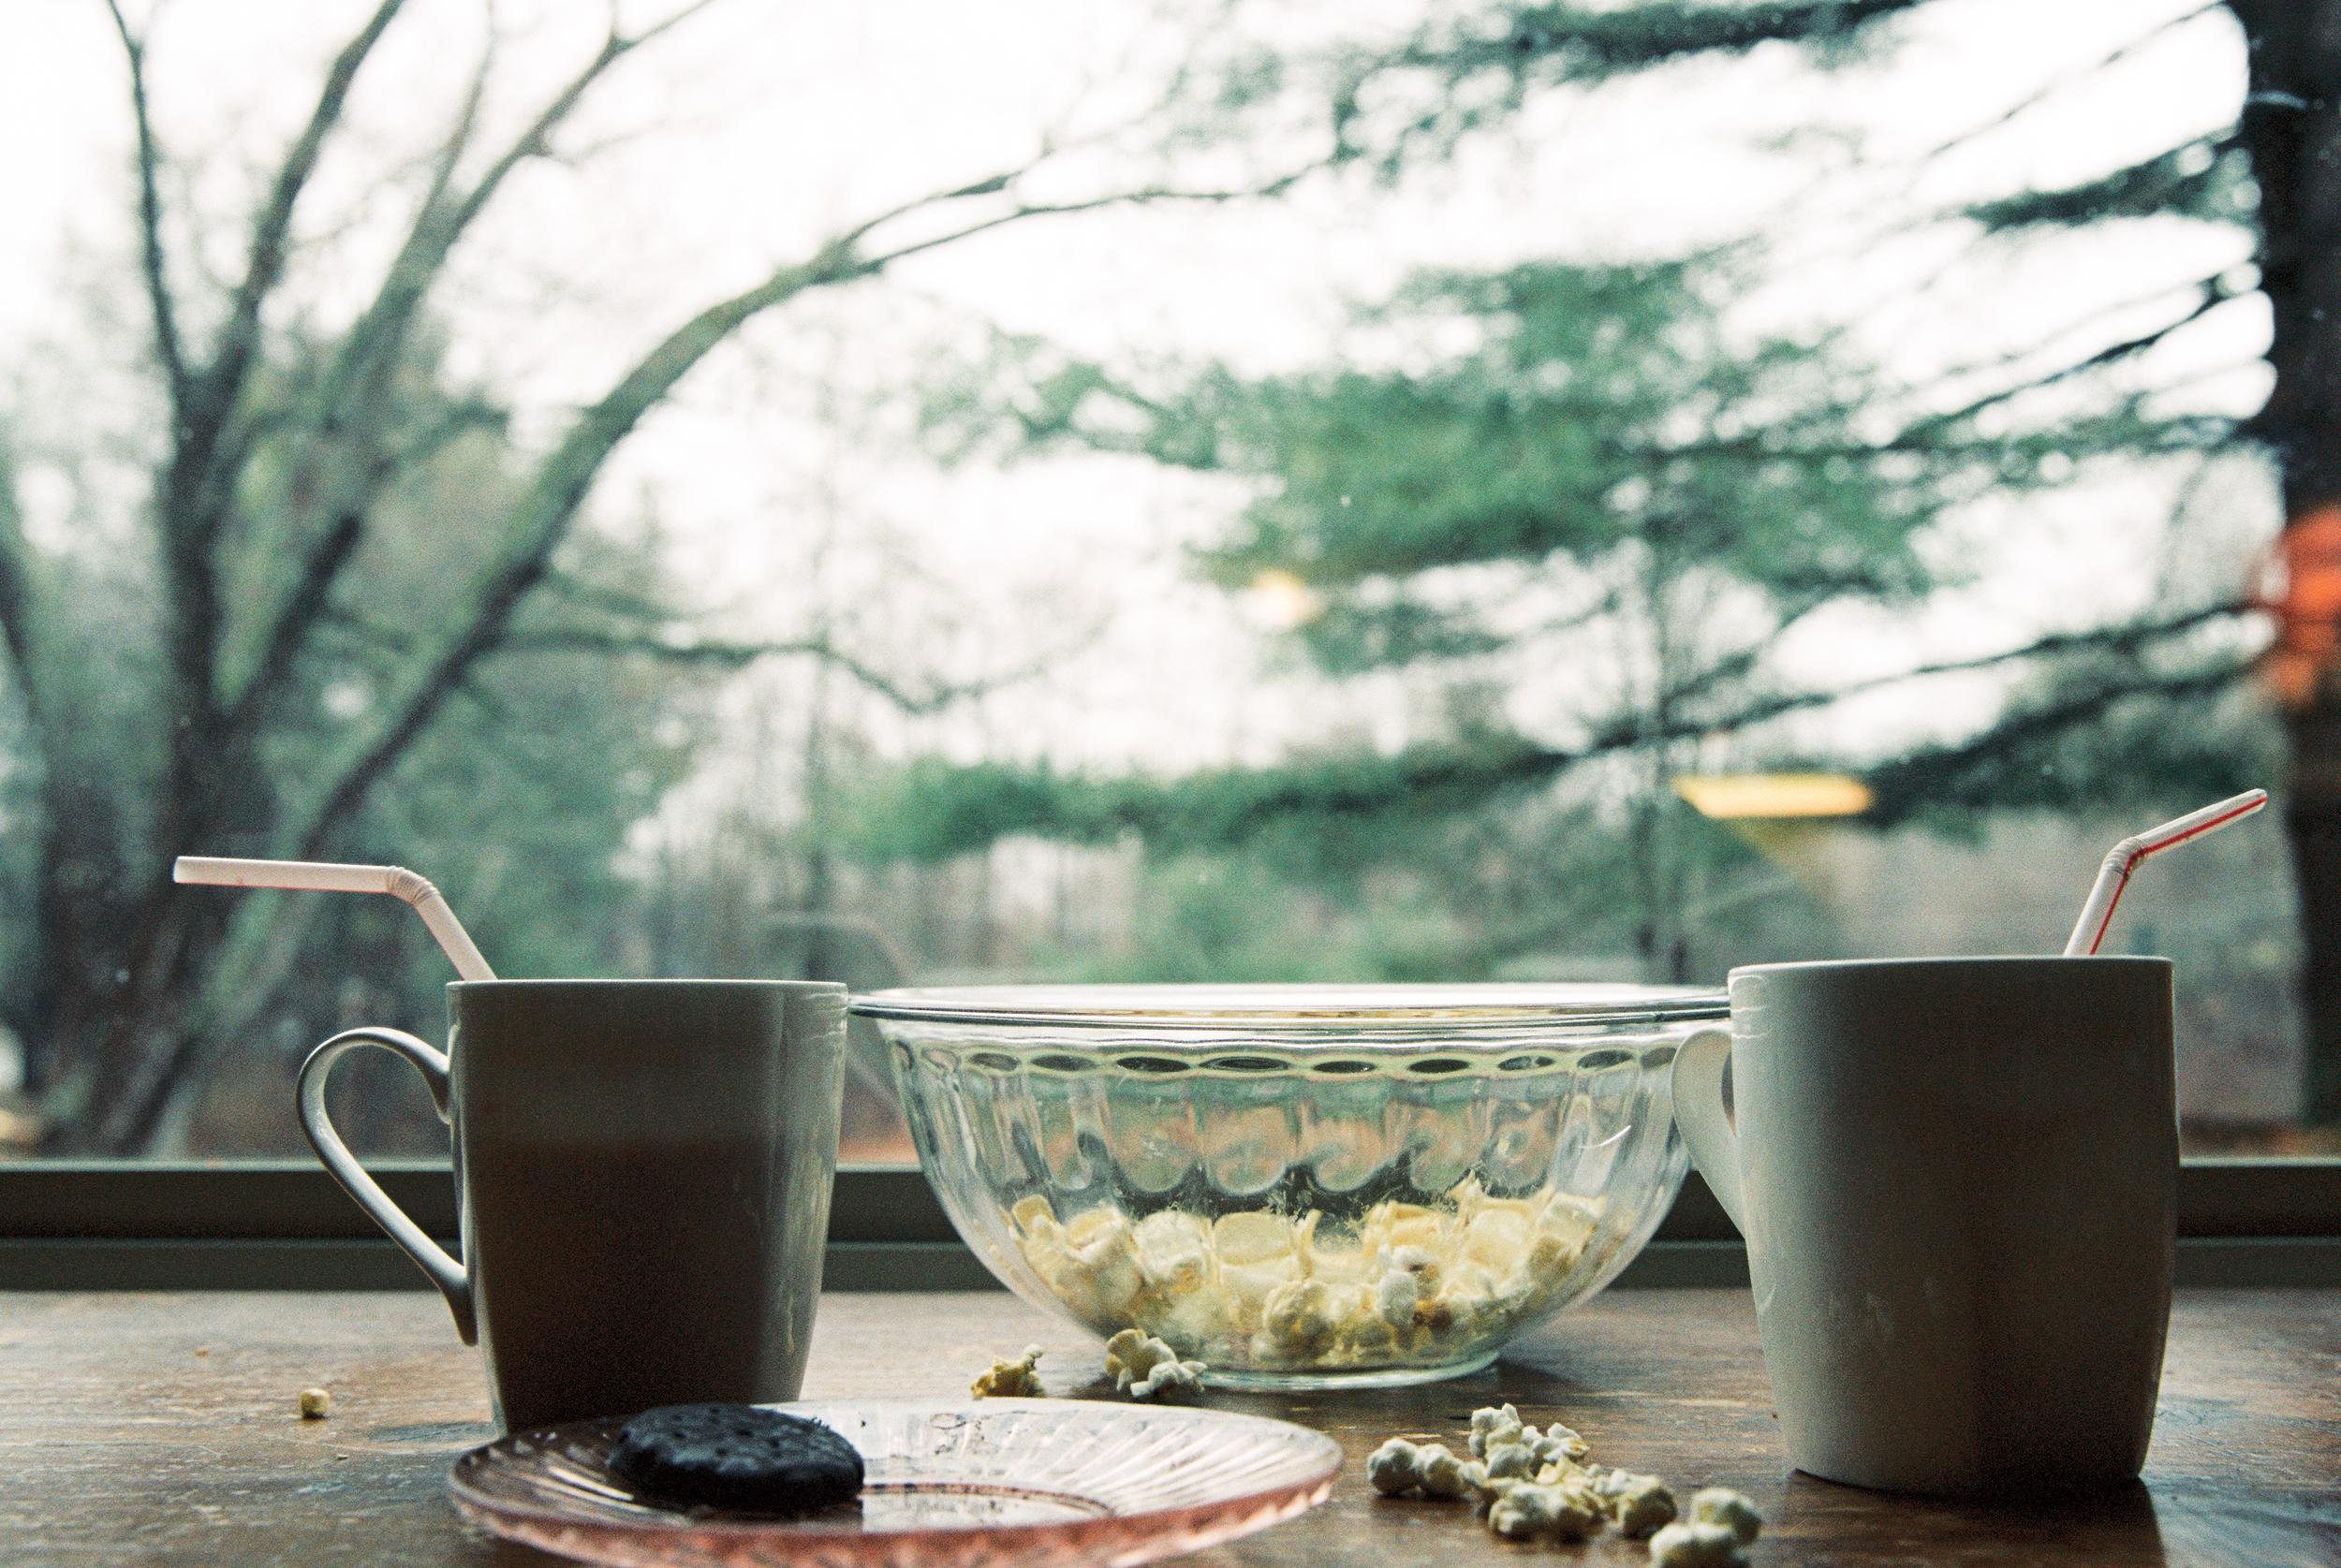 Afterschool Snacks (Canon 1v :: Portra 160)   73/366